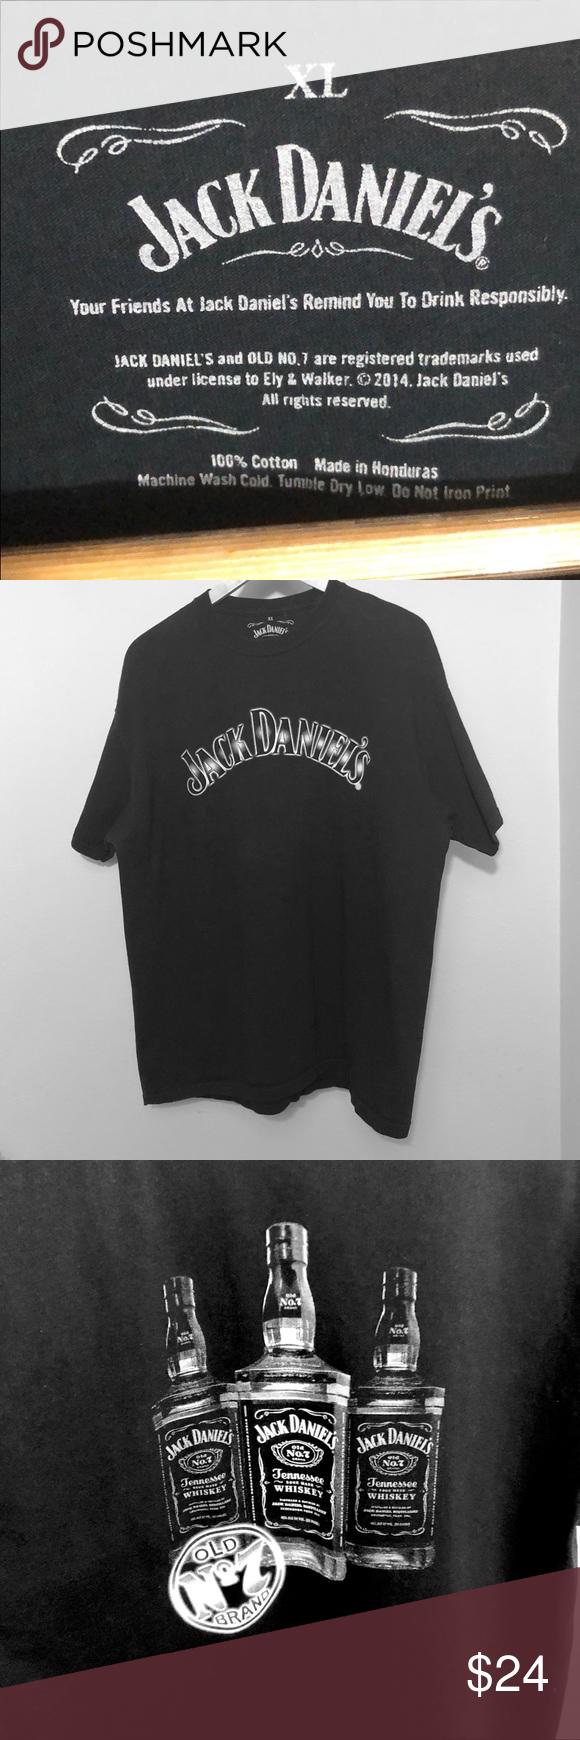 Jack Daniels Tee Whiskey Alcohol T Shirt Mens Xl Jack Daniels Tee Whiskey Alcohol T Shirt Mens Xl Euc Approximate Measu Mens Xl Mens Shirts Jack Daniels Shirt [ 1740 x 580 Pixel ]